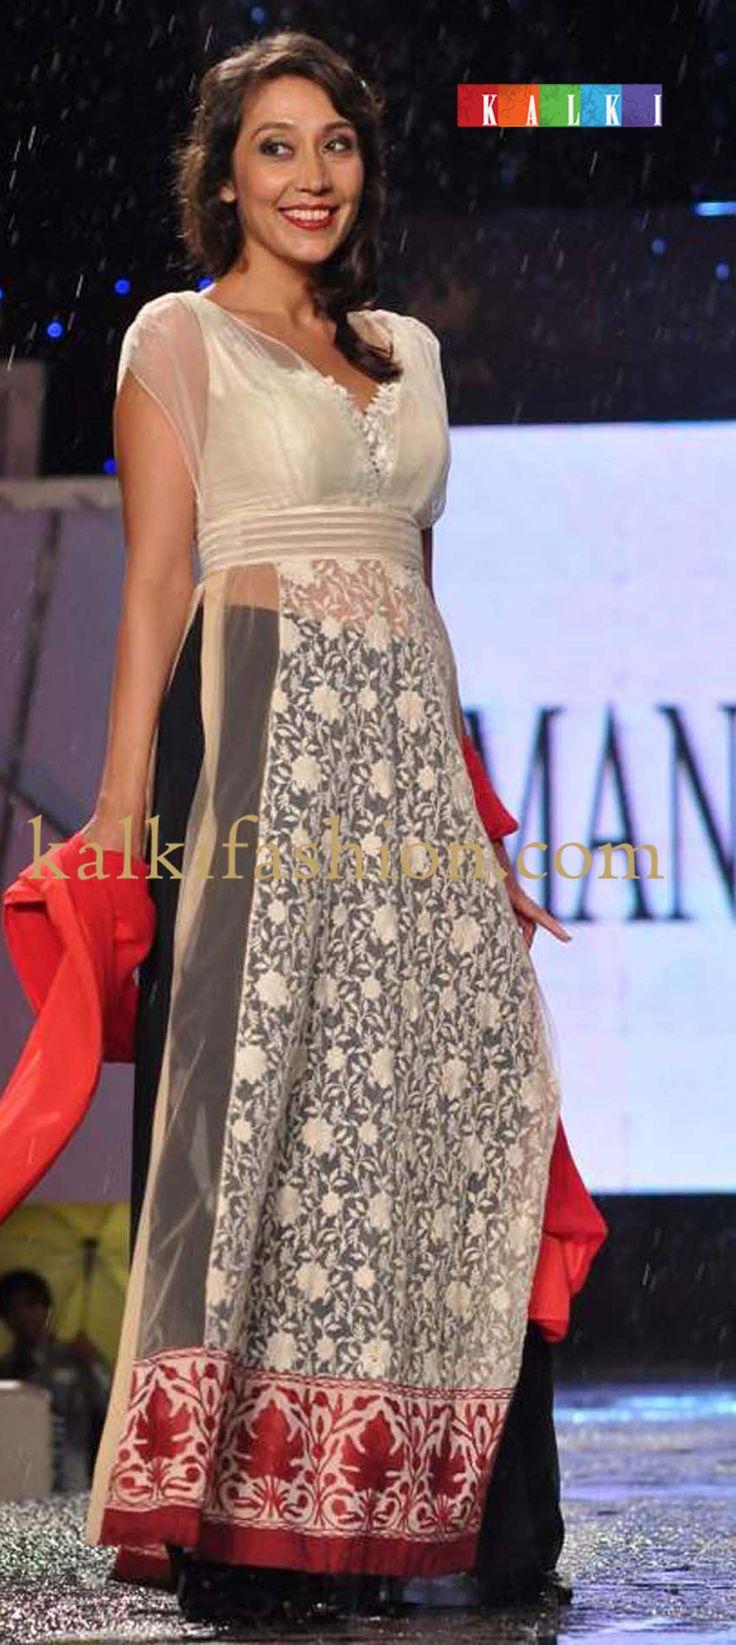 http://www.kalkifashion.com/designers/manish-malhotra.html   cpaa-fachion-show-2013-by-manish-malhotra